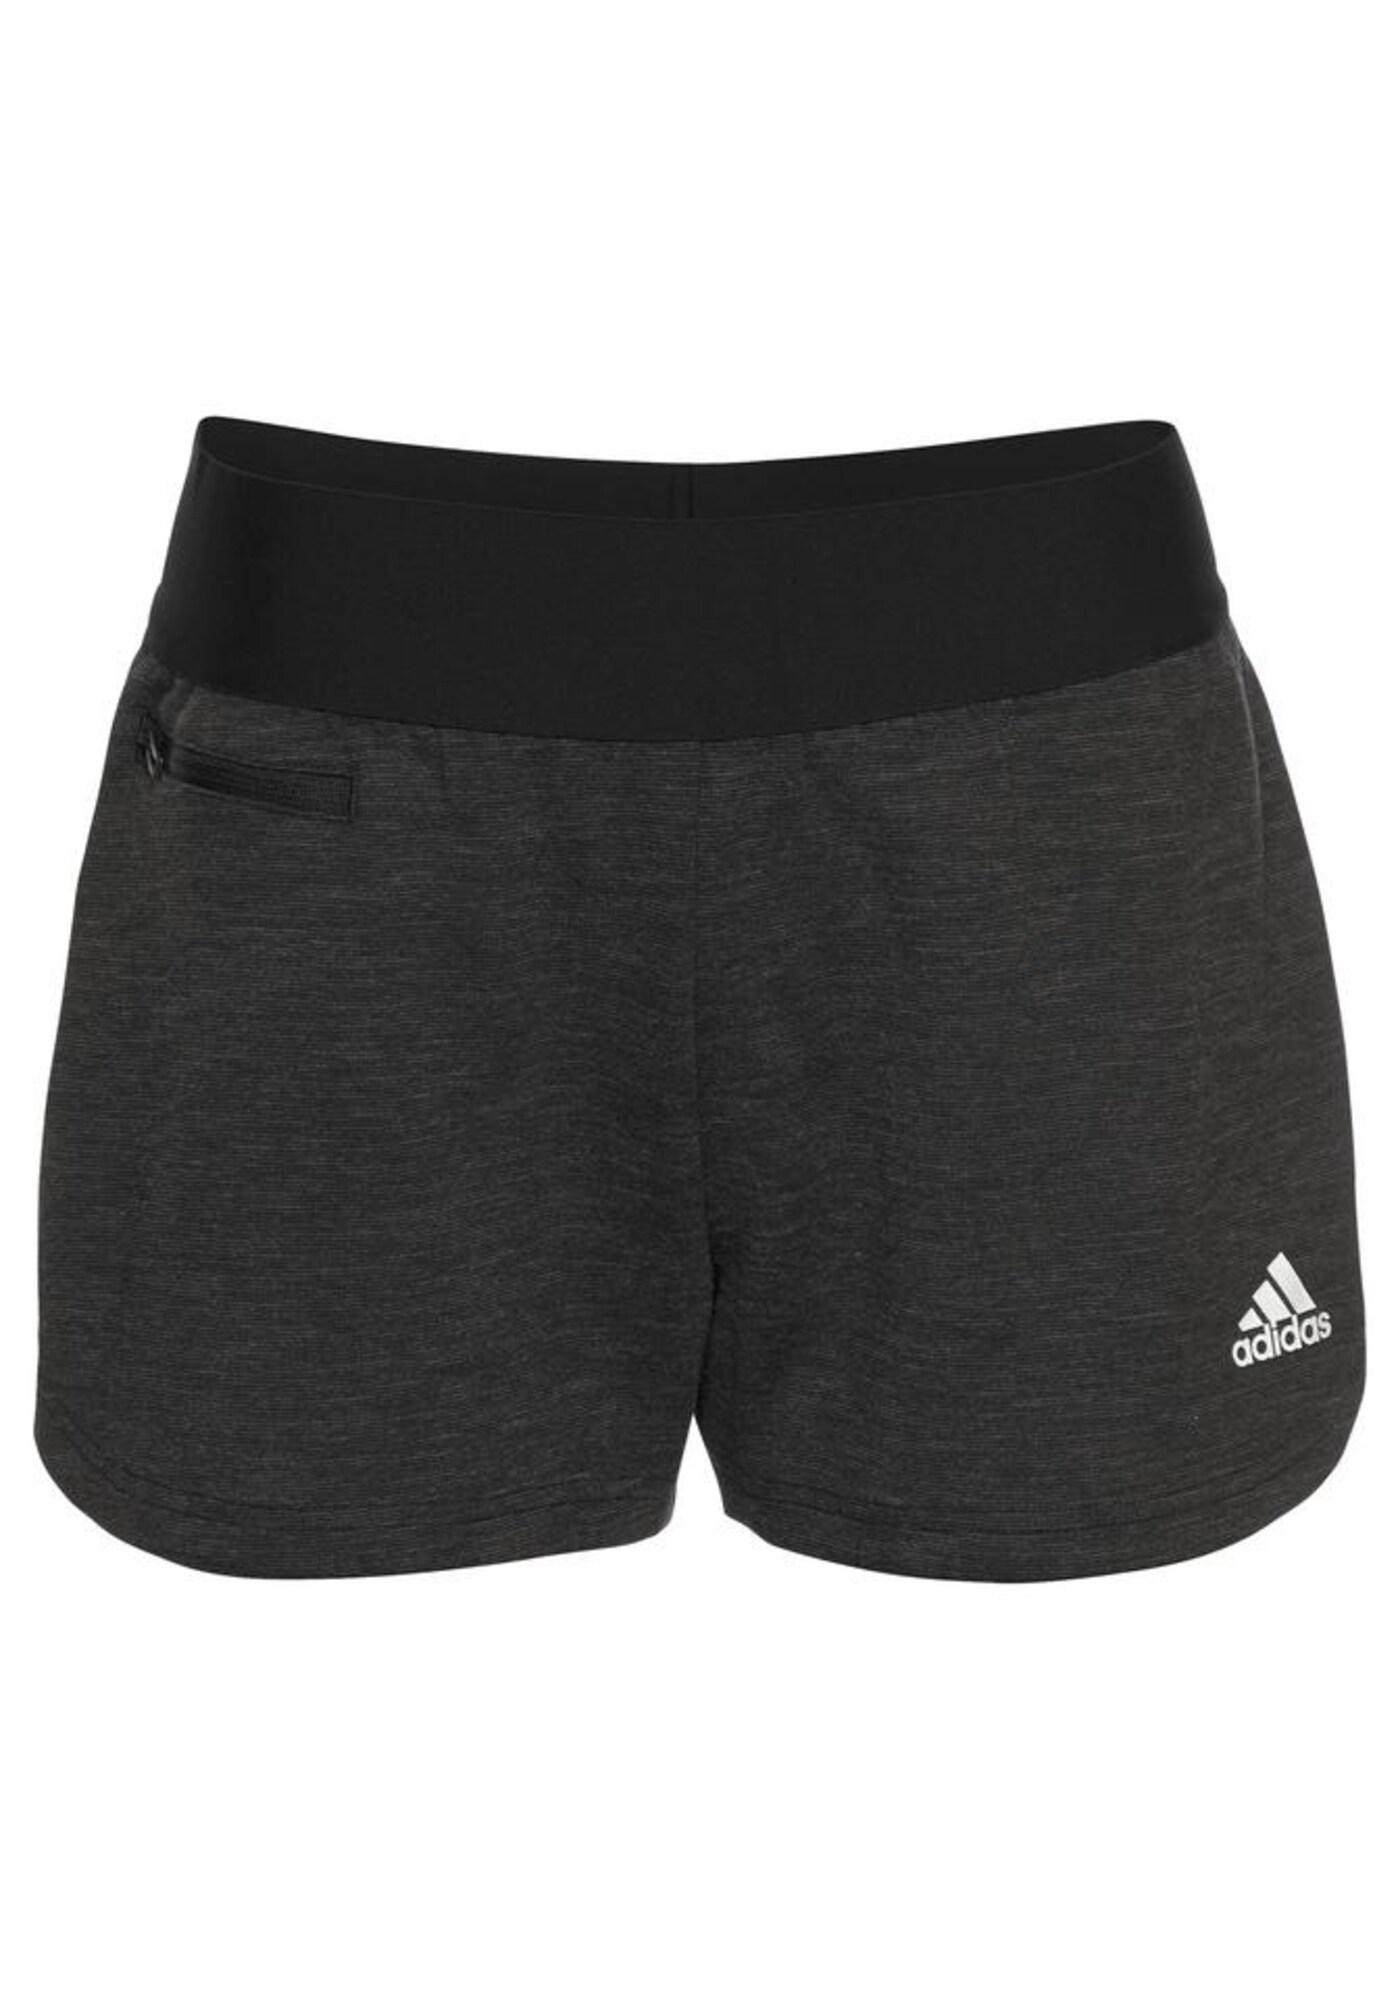 Sportovní kalhoty Id Stadium St černý melír bílá ADIDAS PERFORMANCE